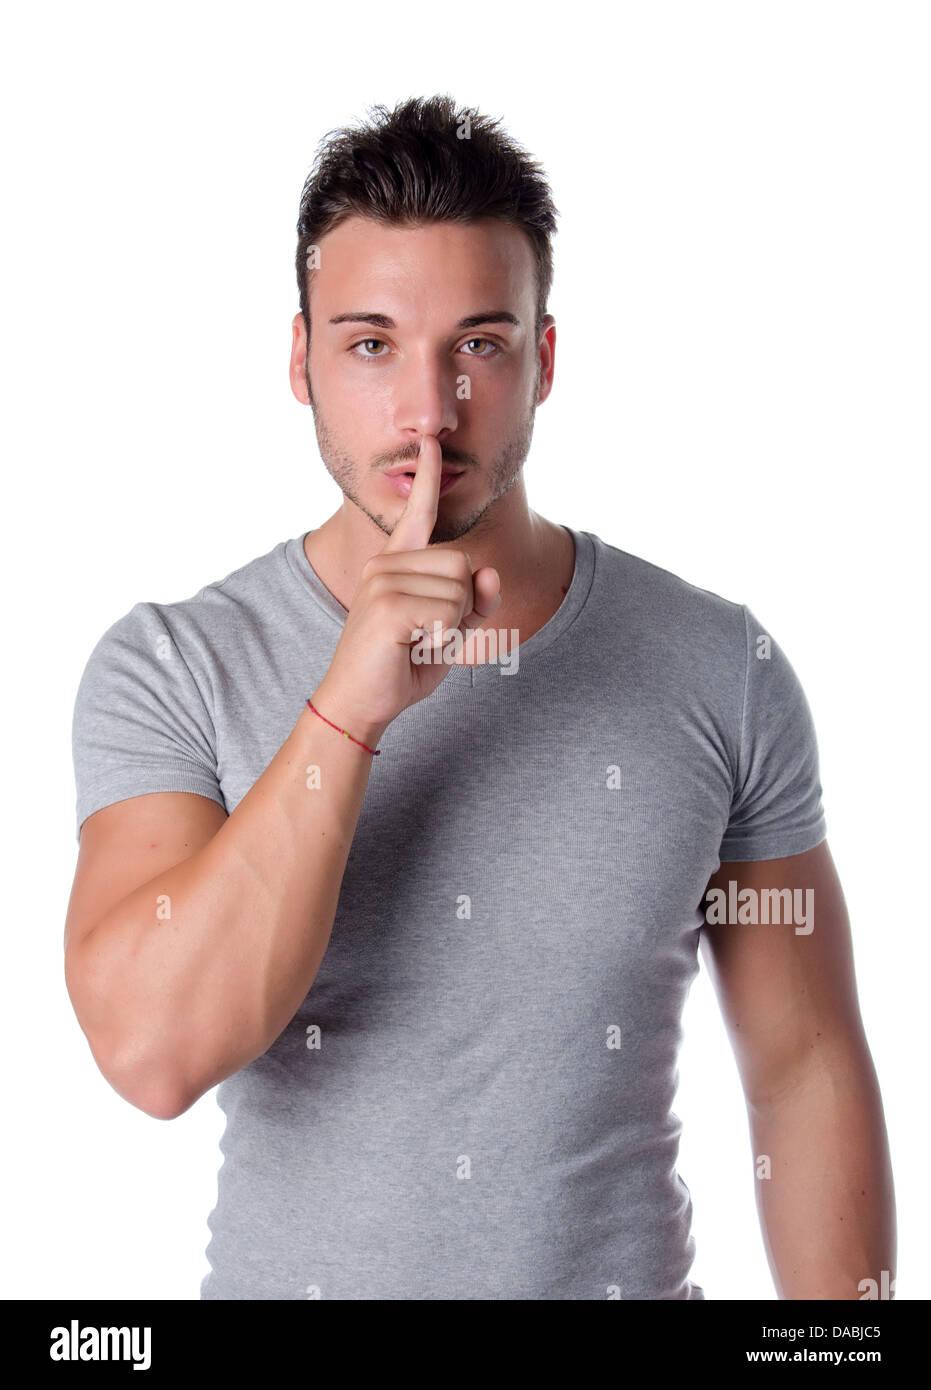 Hush. Young man silencing you, saying shut - Stock Image